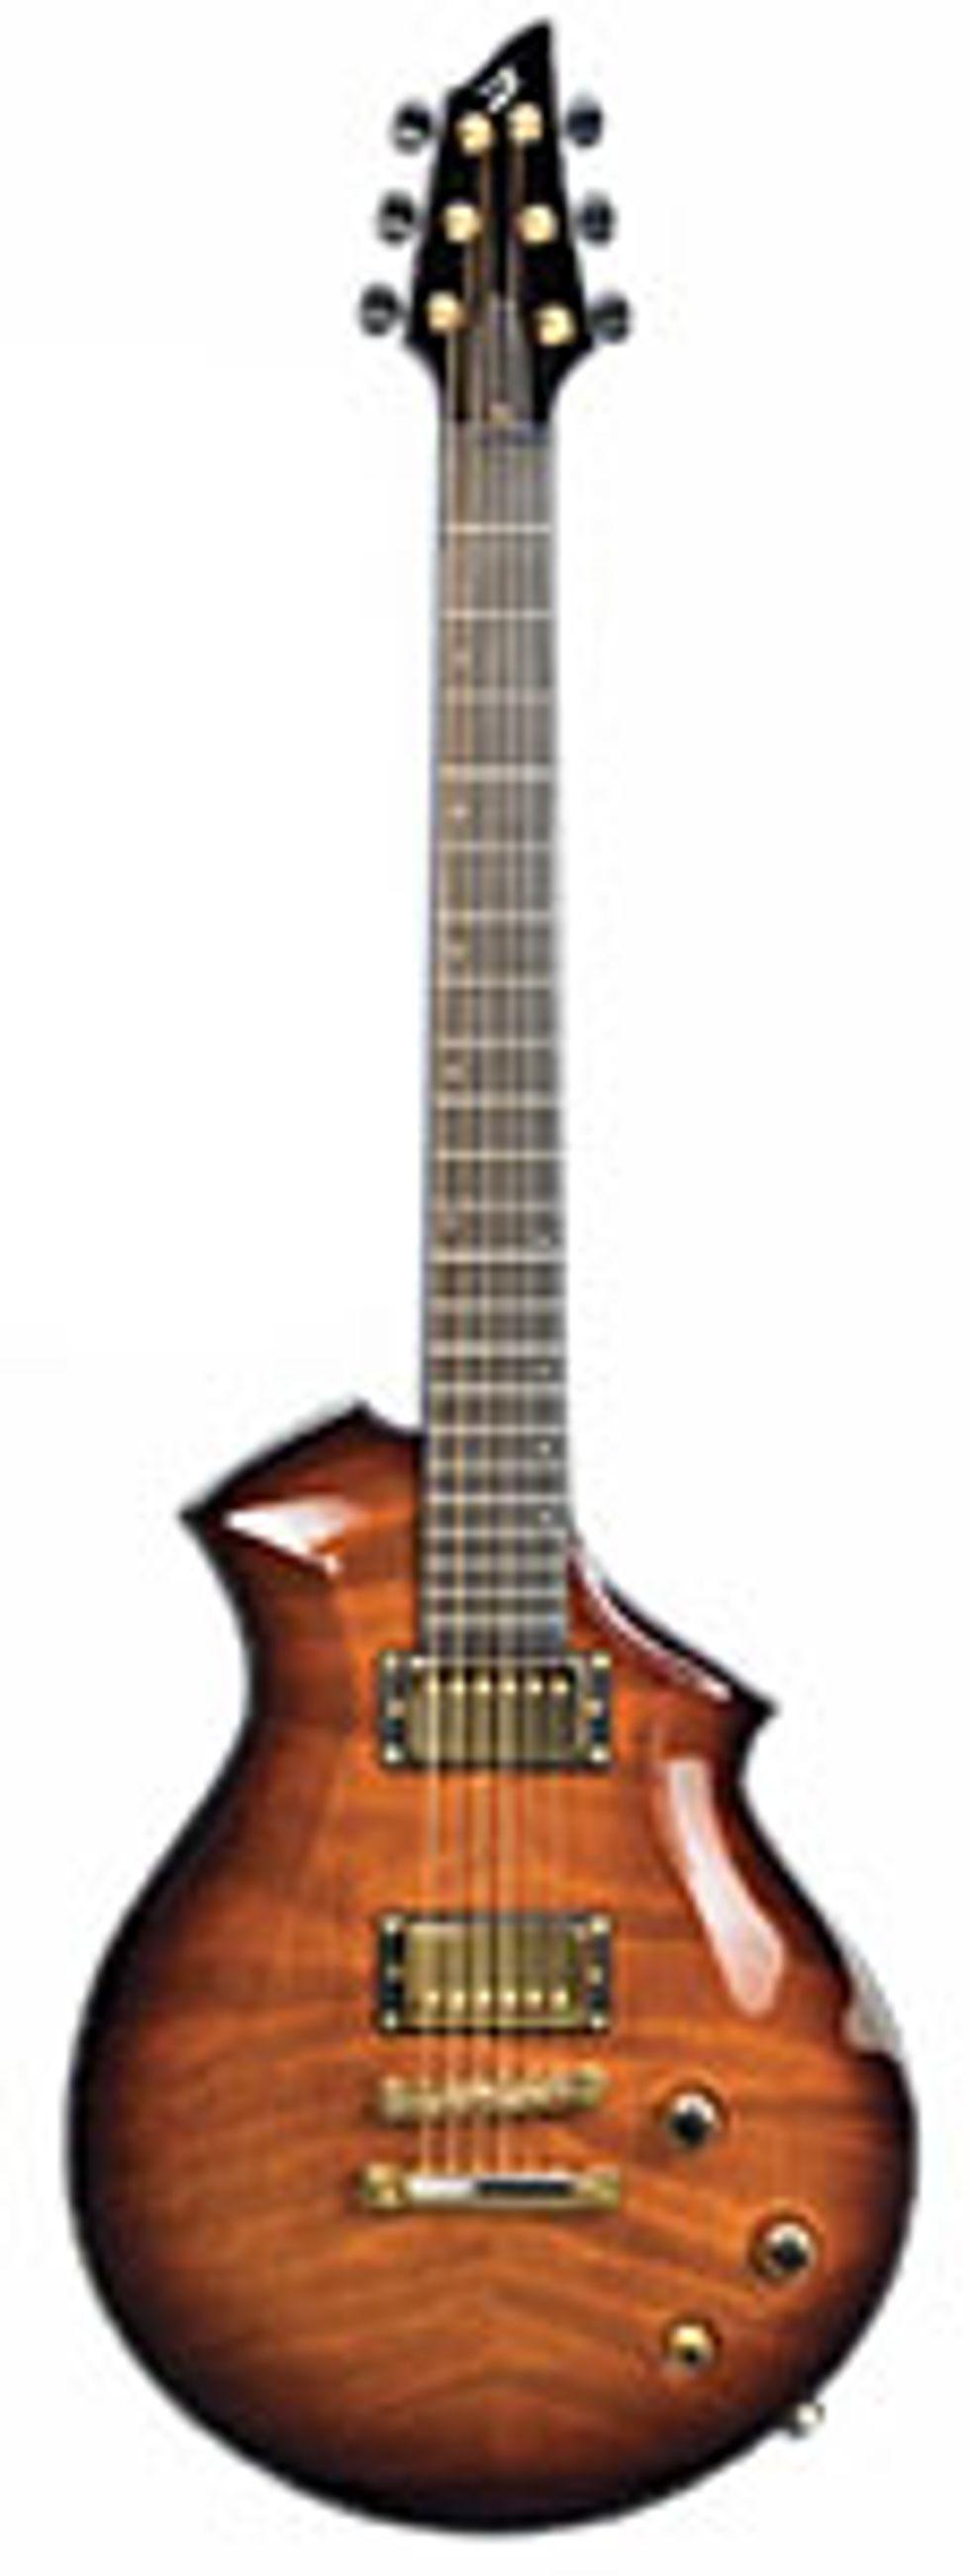 Breedlove Mark I Electric Guitar